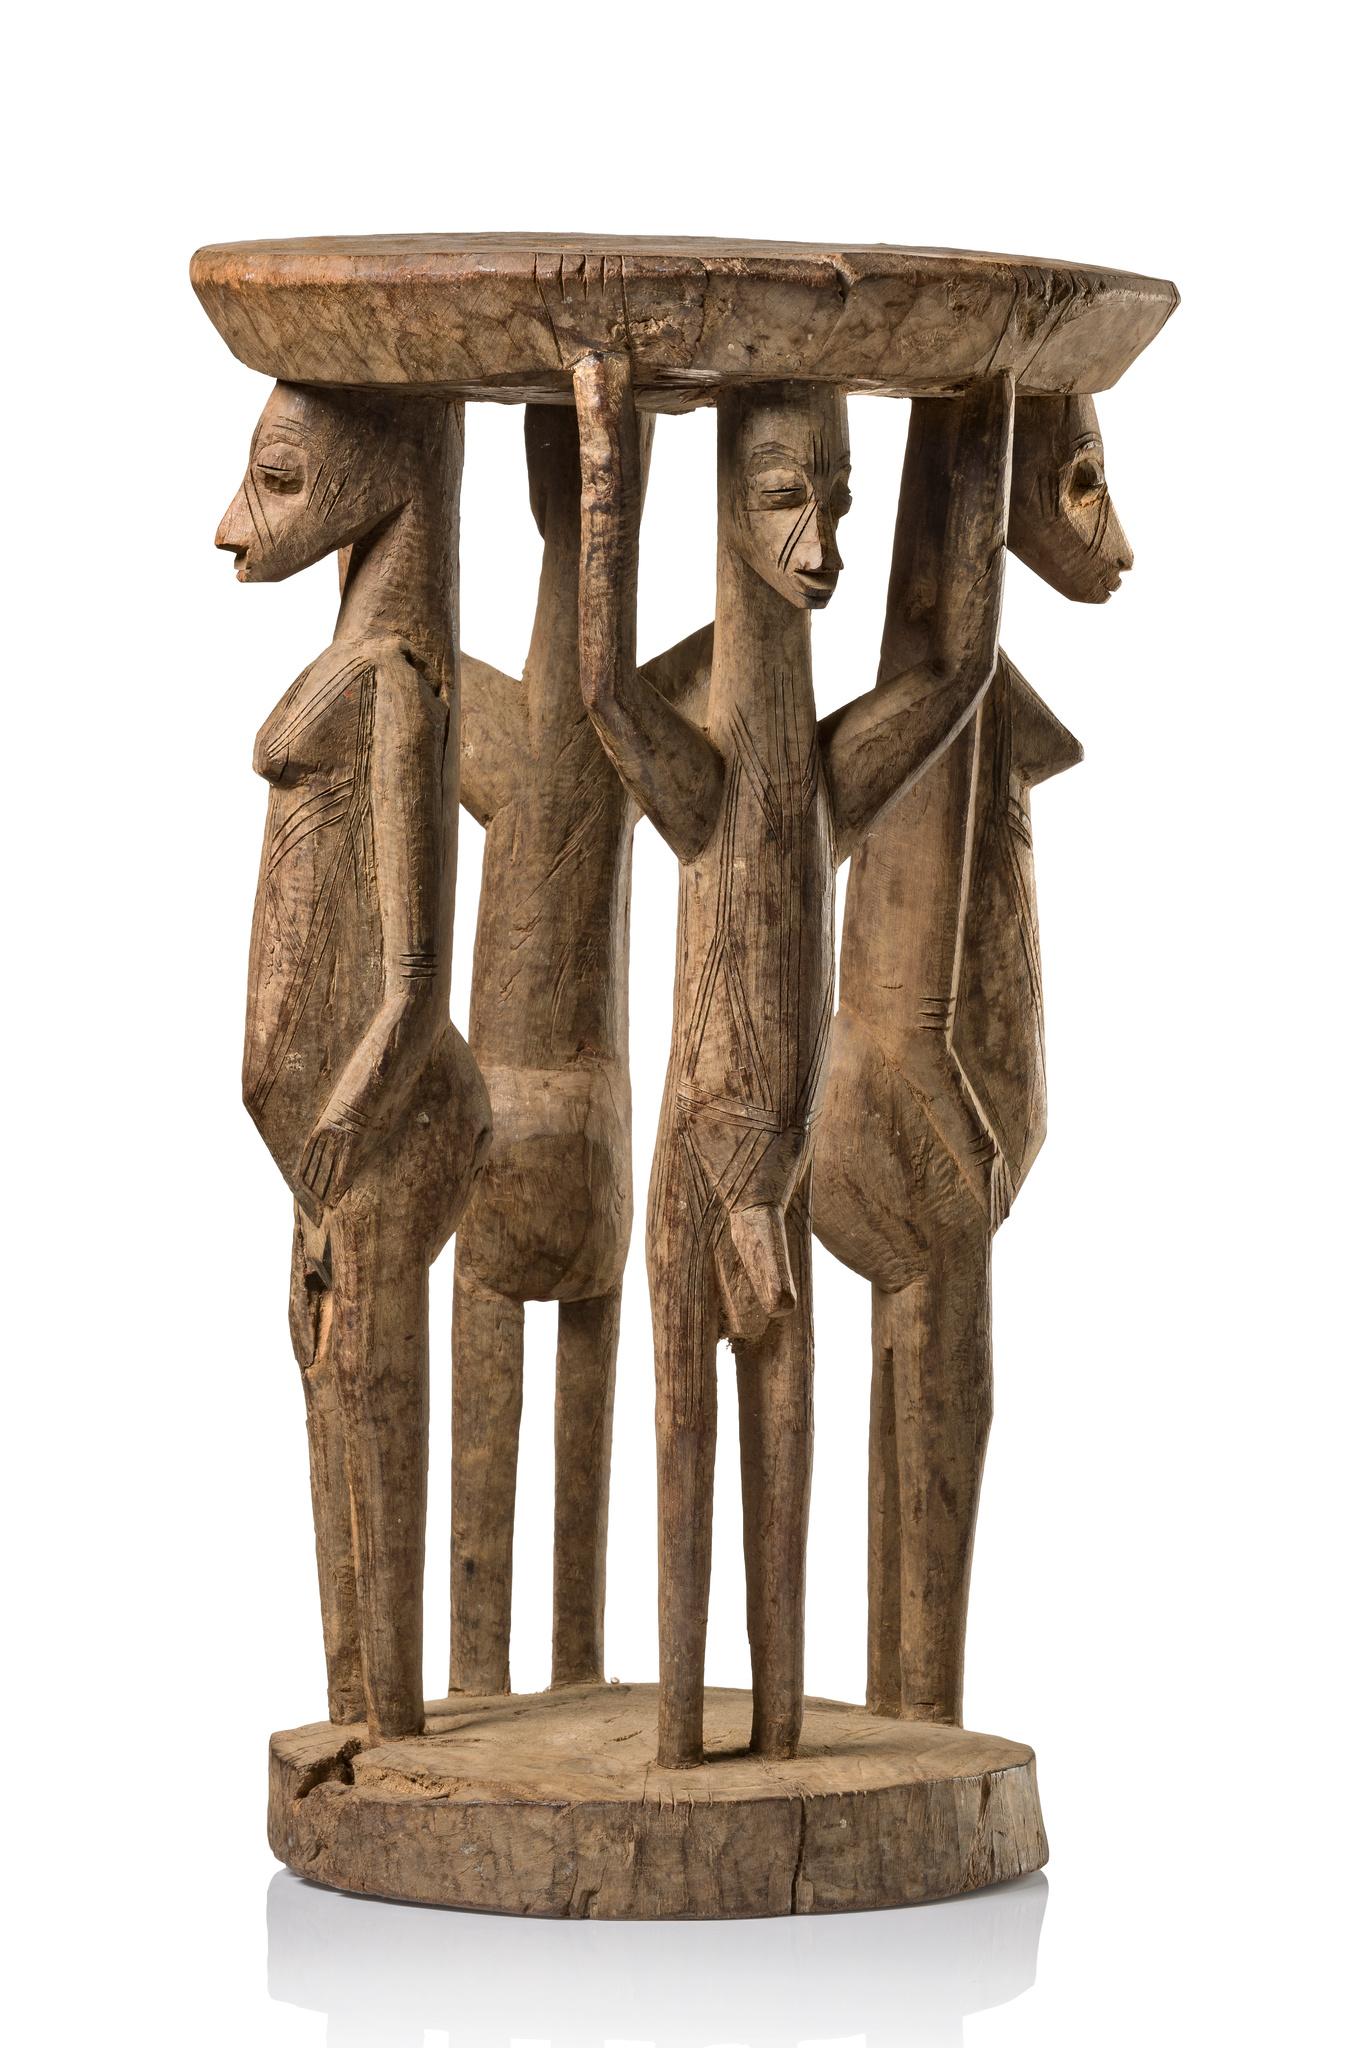 Very rare figural stool